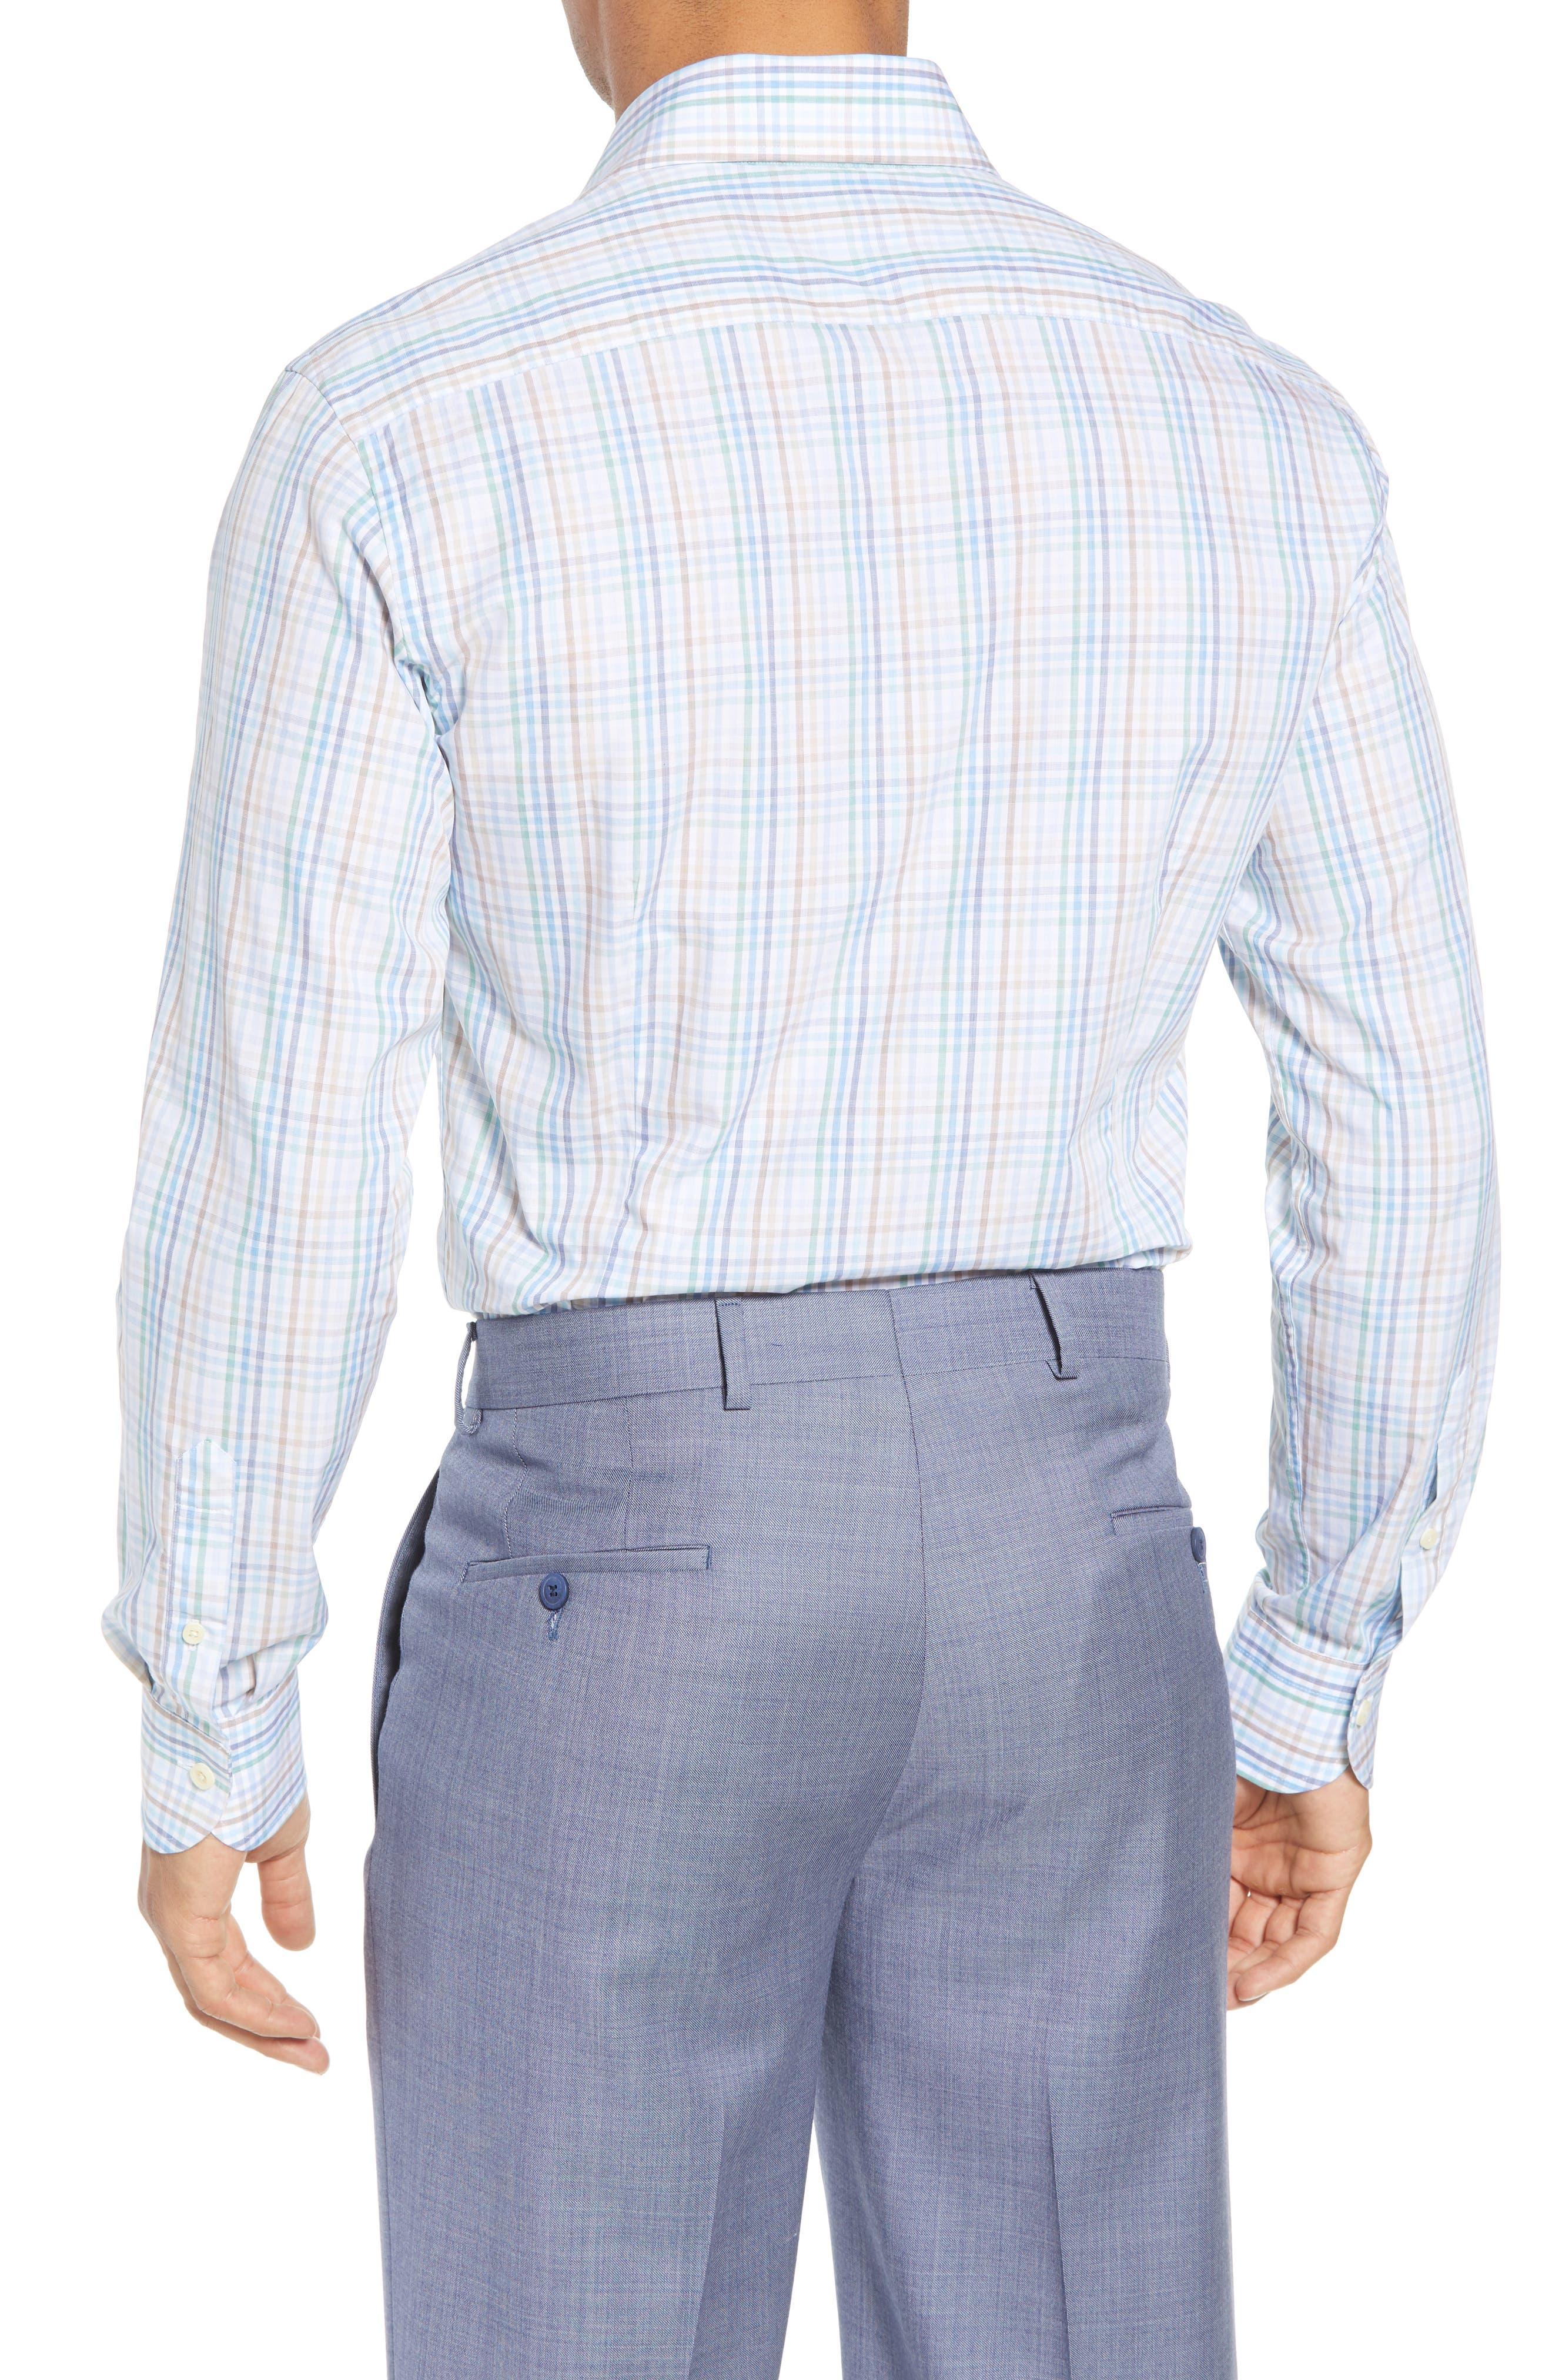 Albright Slim Fit Check Dress Shirt,                             Alternate thumbnail 3, color,                             308